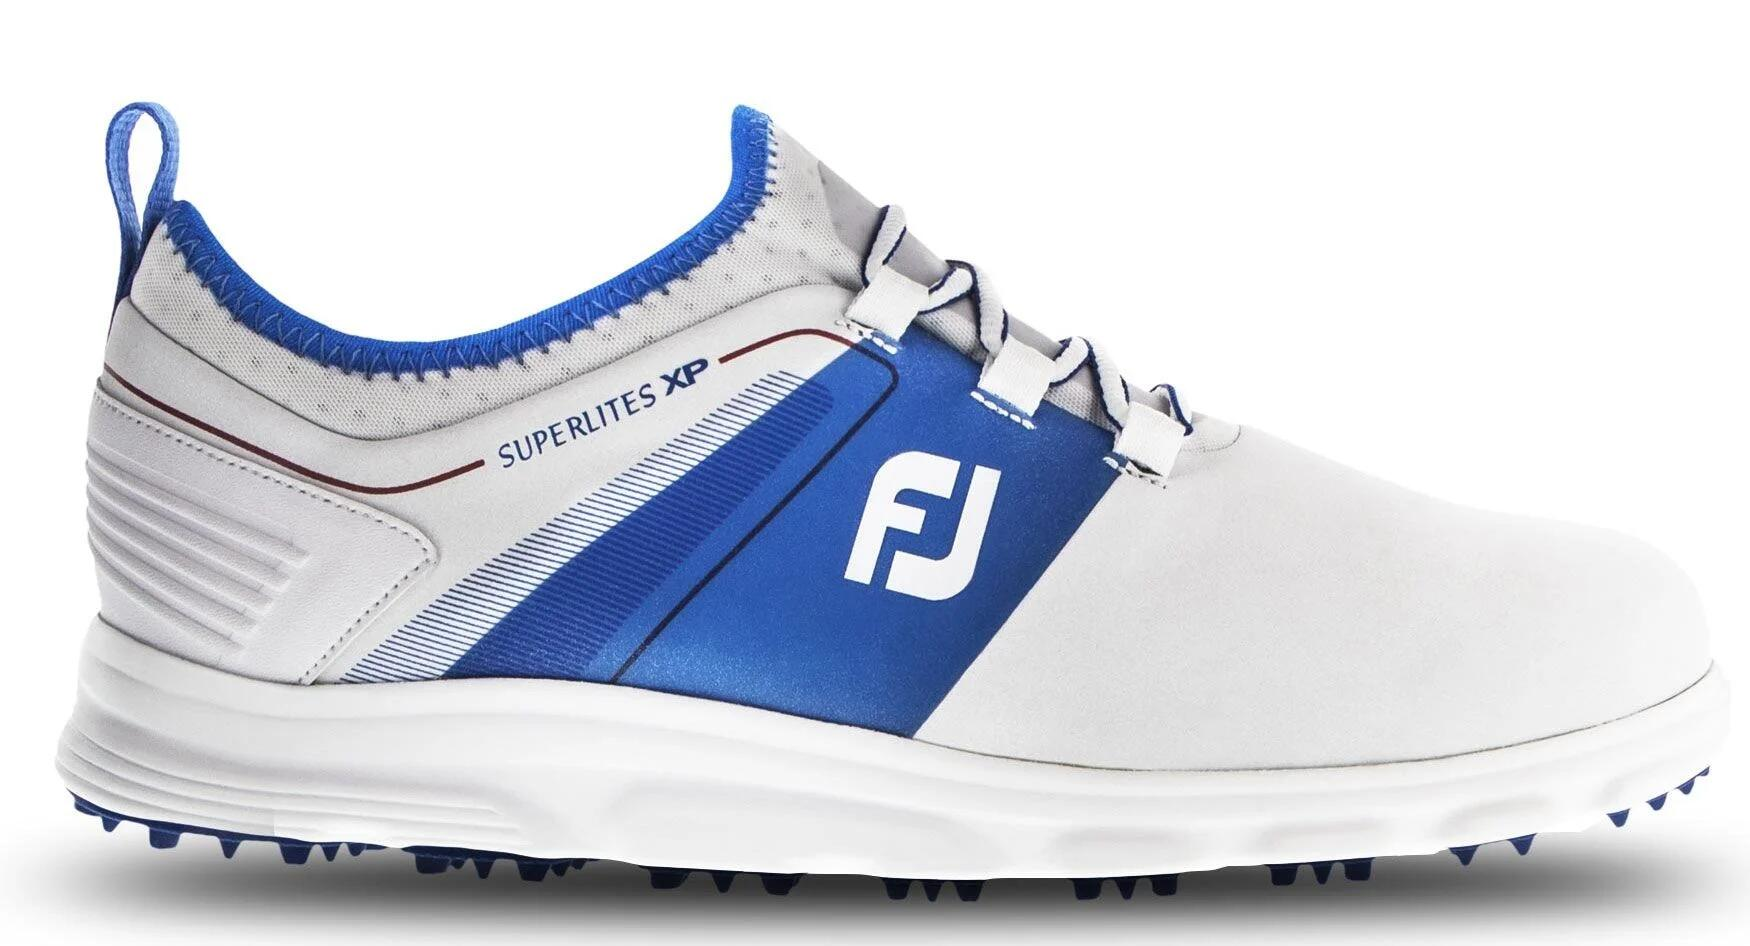 Footjoy Superlites XP Golf Shoes White